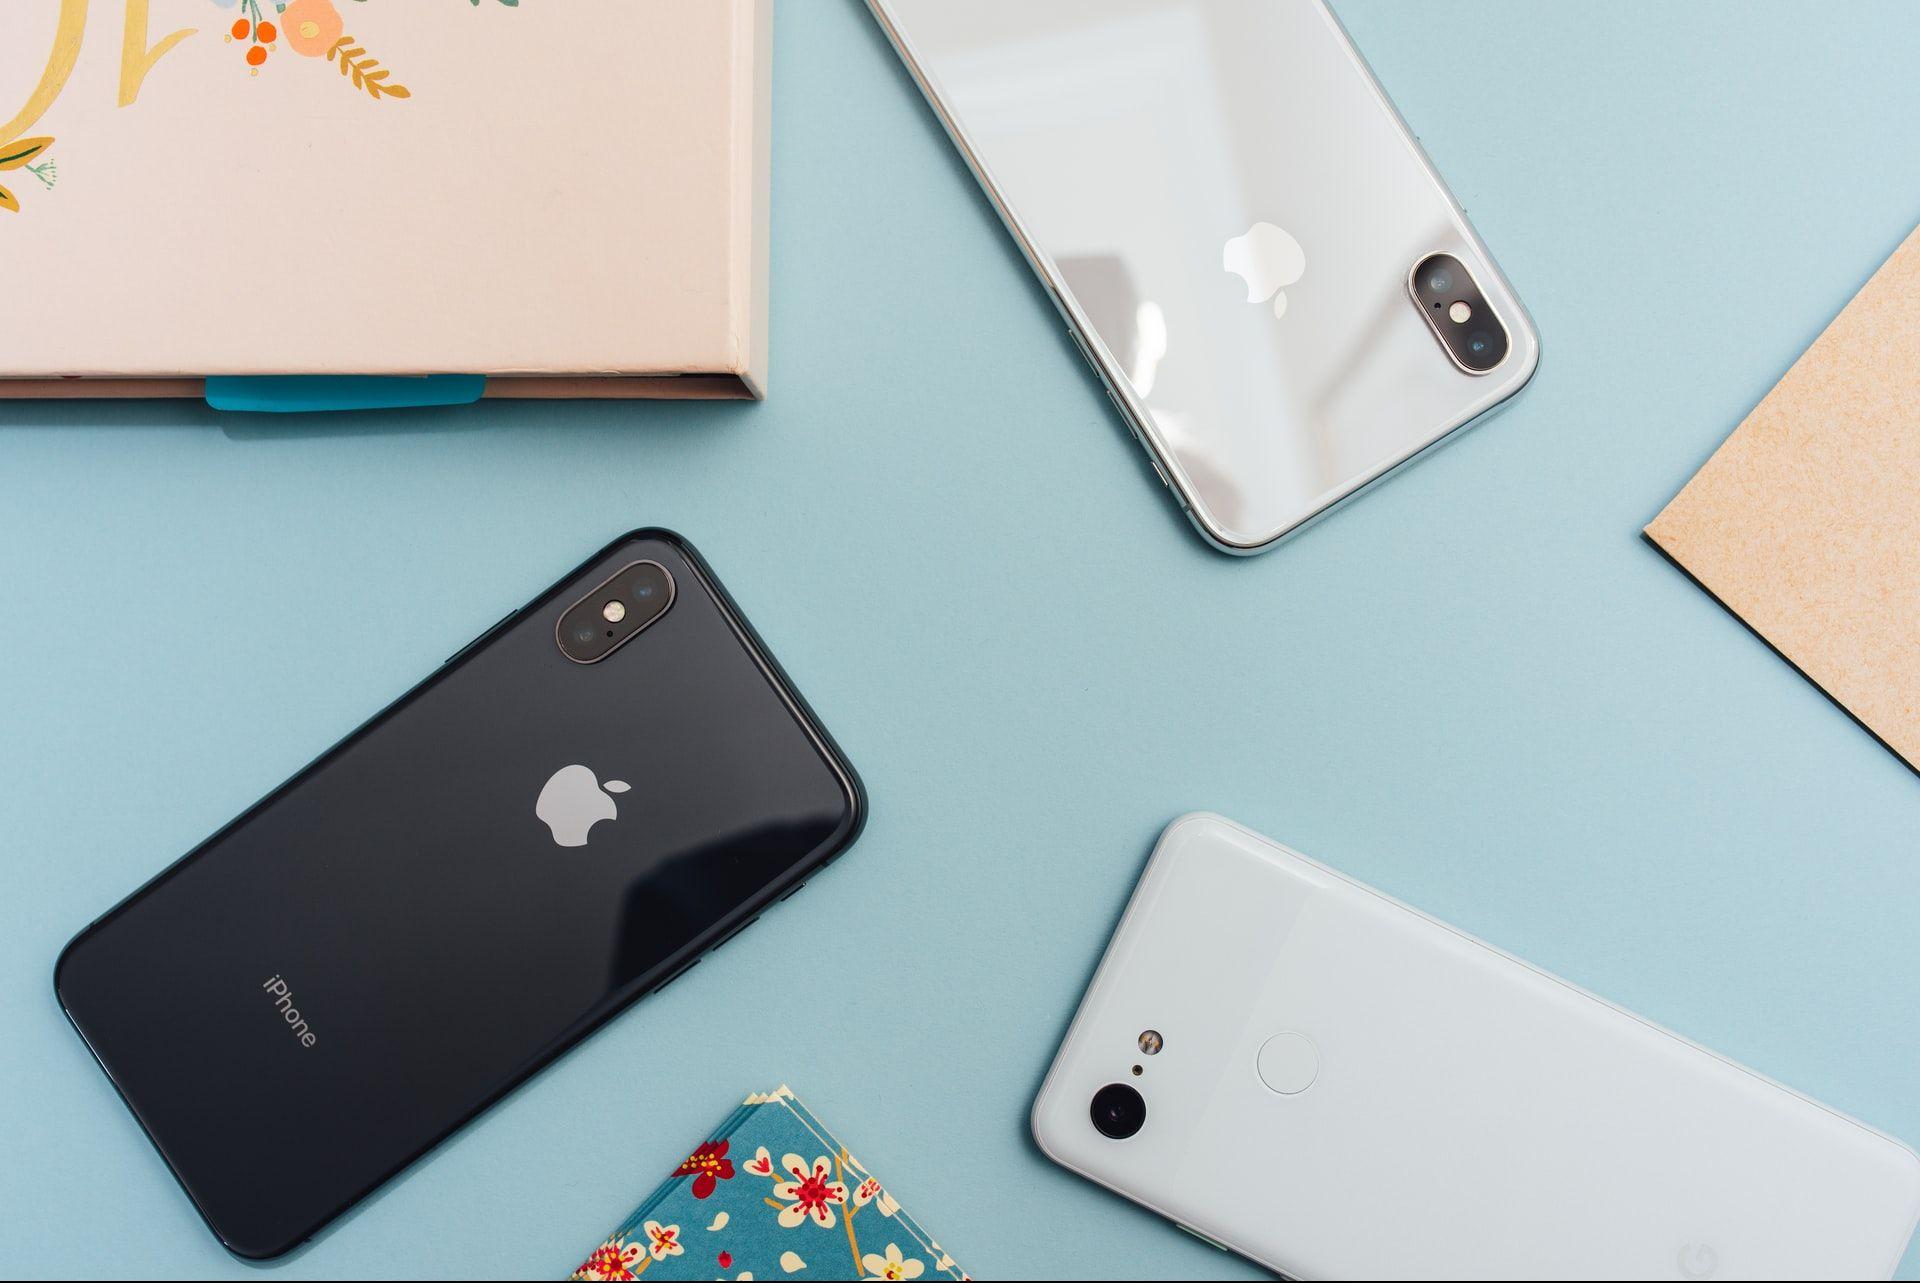 <i>Apple </i>начнет продавать гаджеты вмагазинах <i>LG</i>